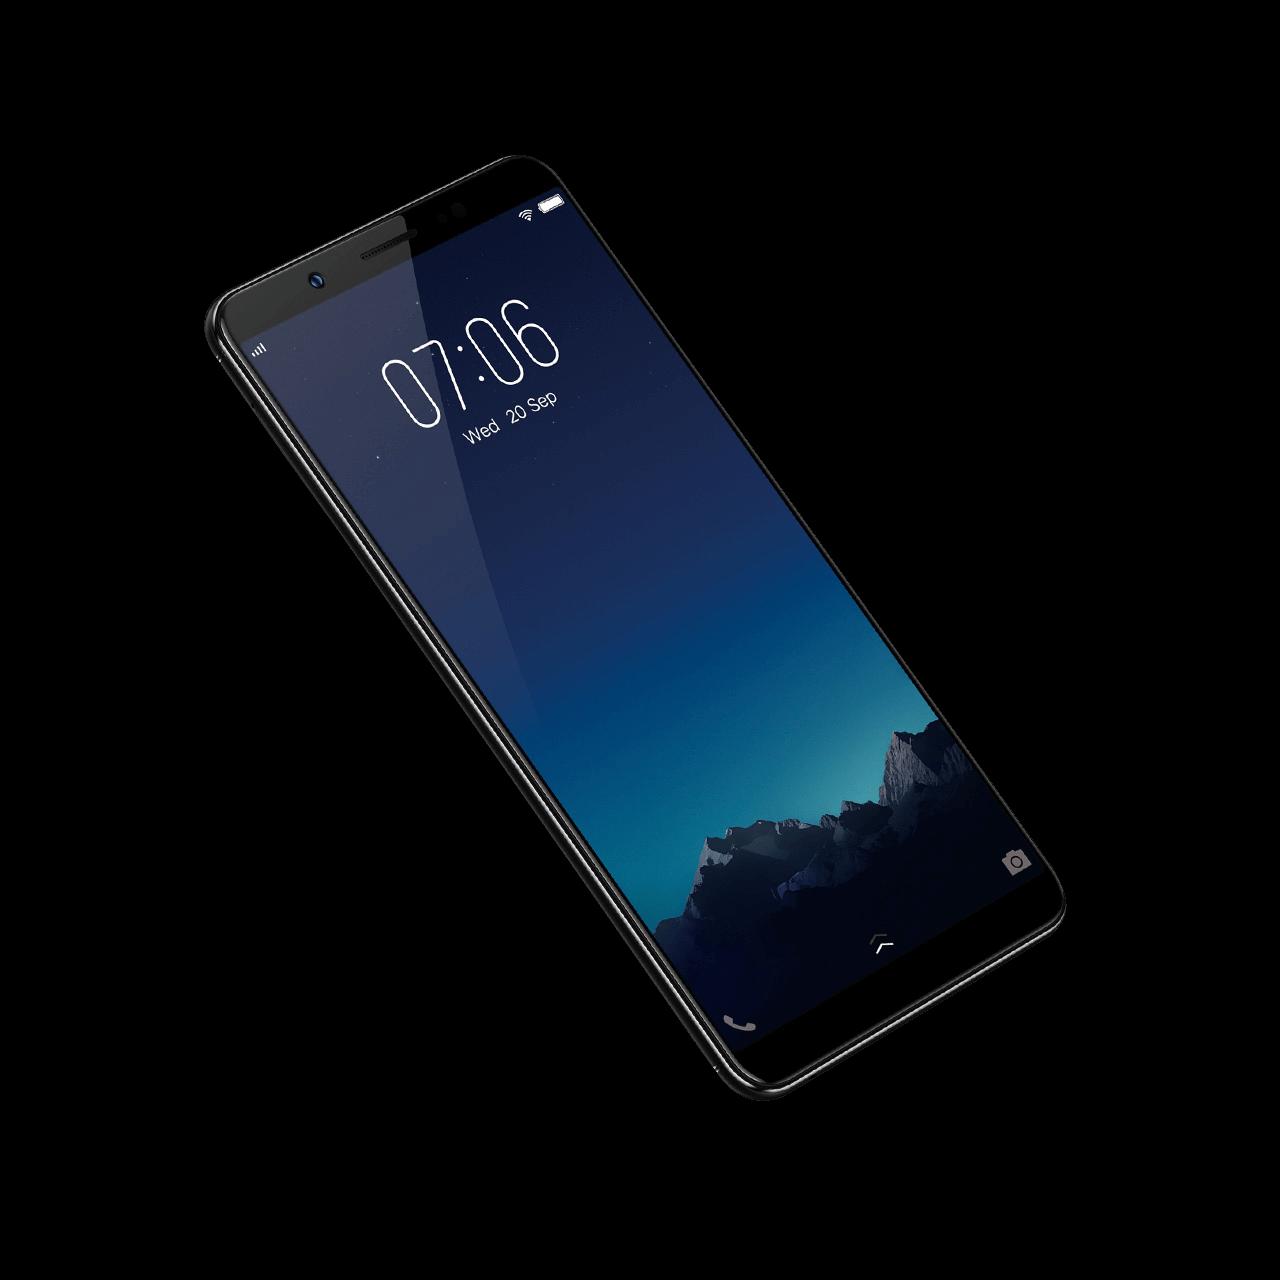 android, power efficient, qualcomm, smartphones, vivo, vivo v7, vivo v7+